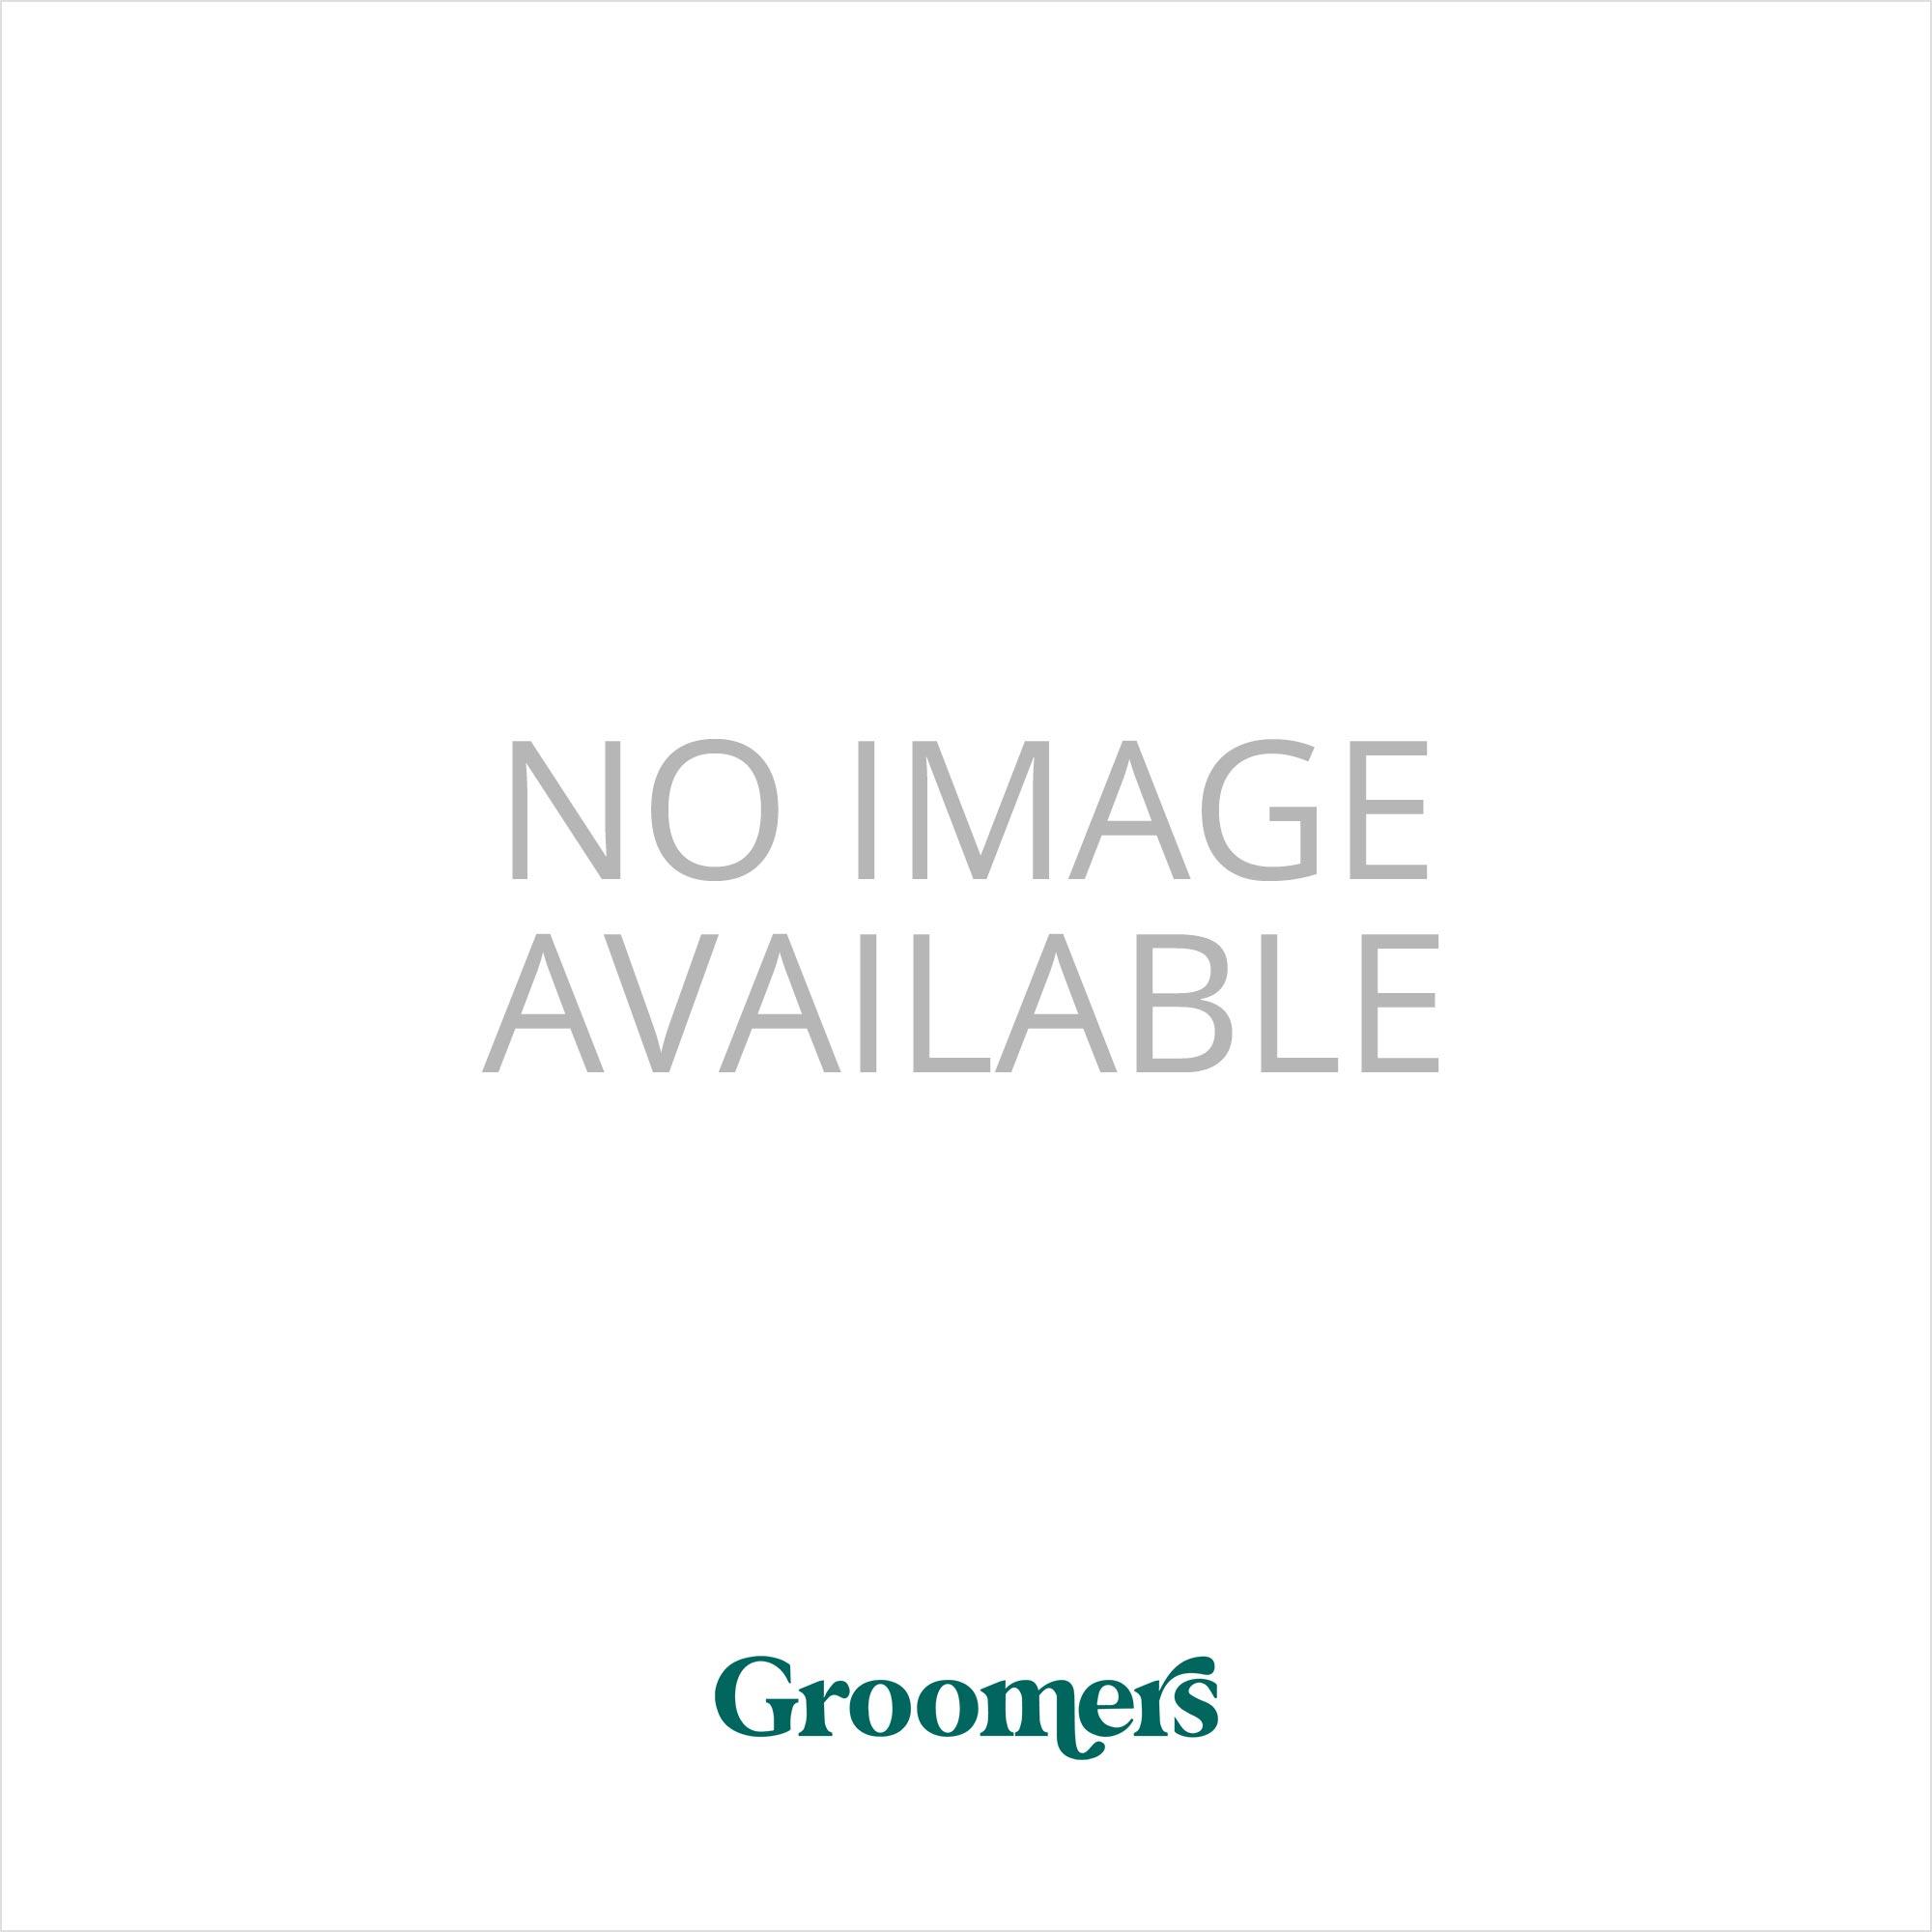 Groomers Evening Primrose Oil Food Supplement - 1L